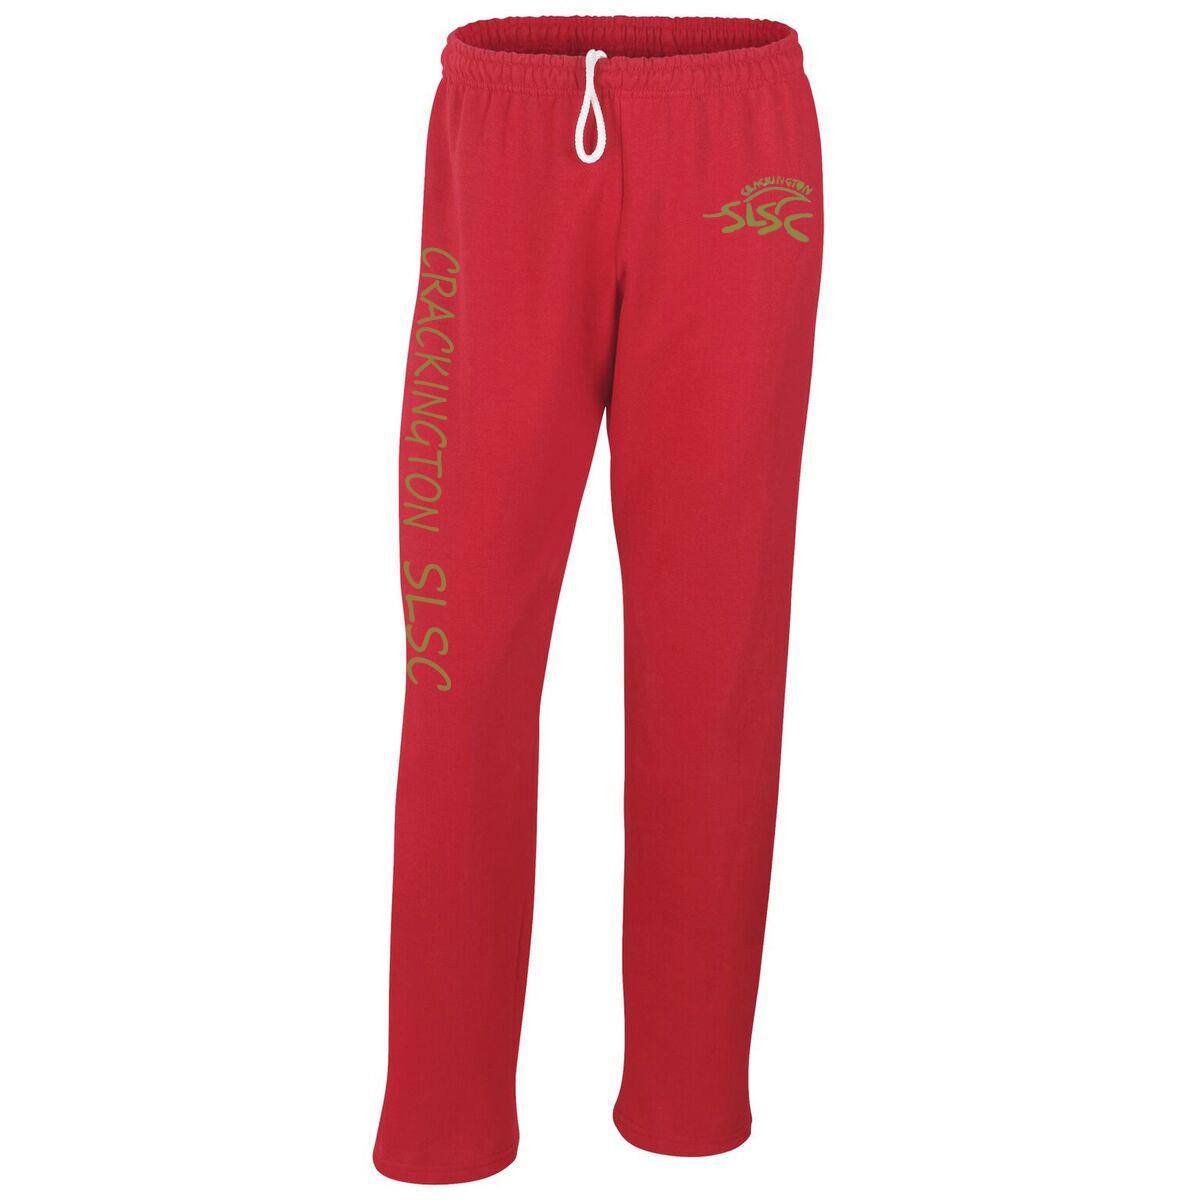 Cracking SLSC Jog Pants